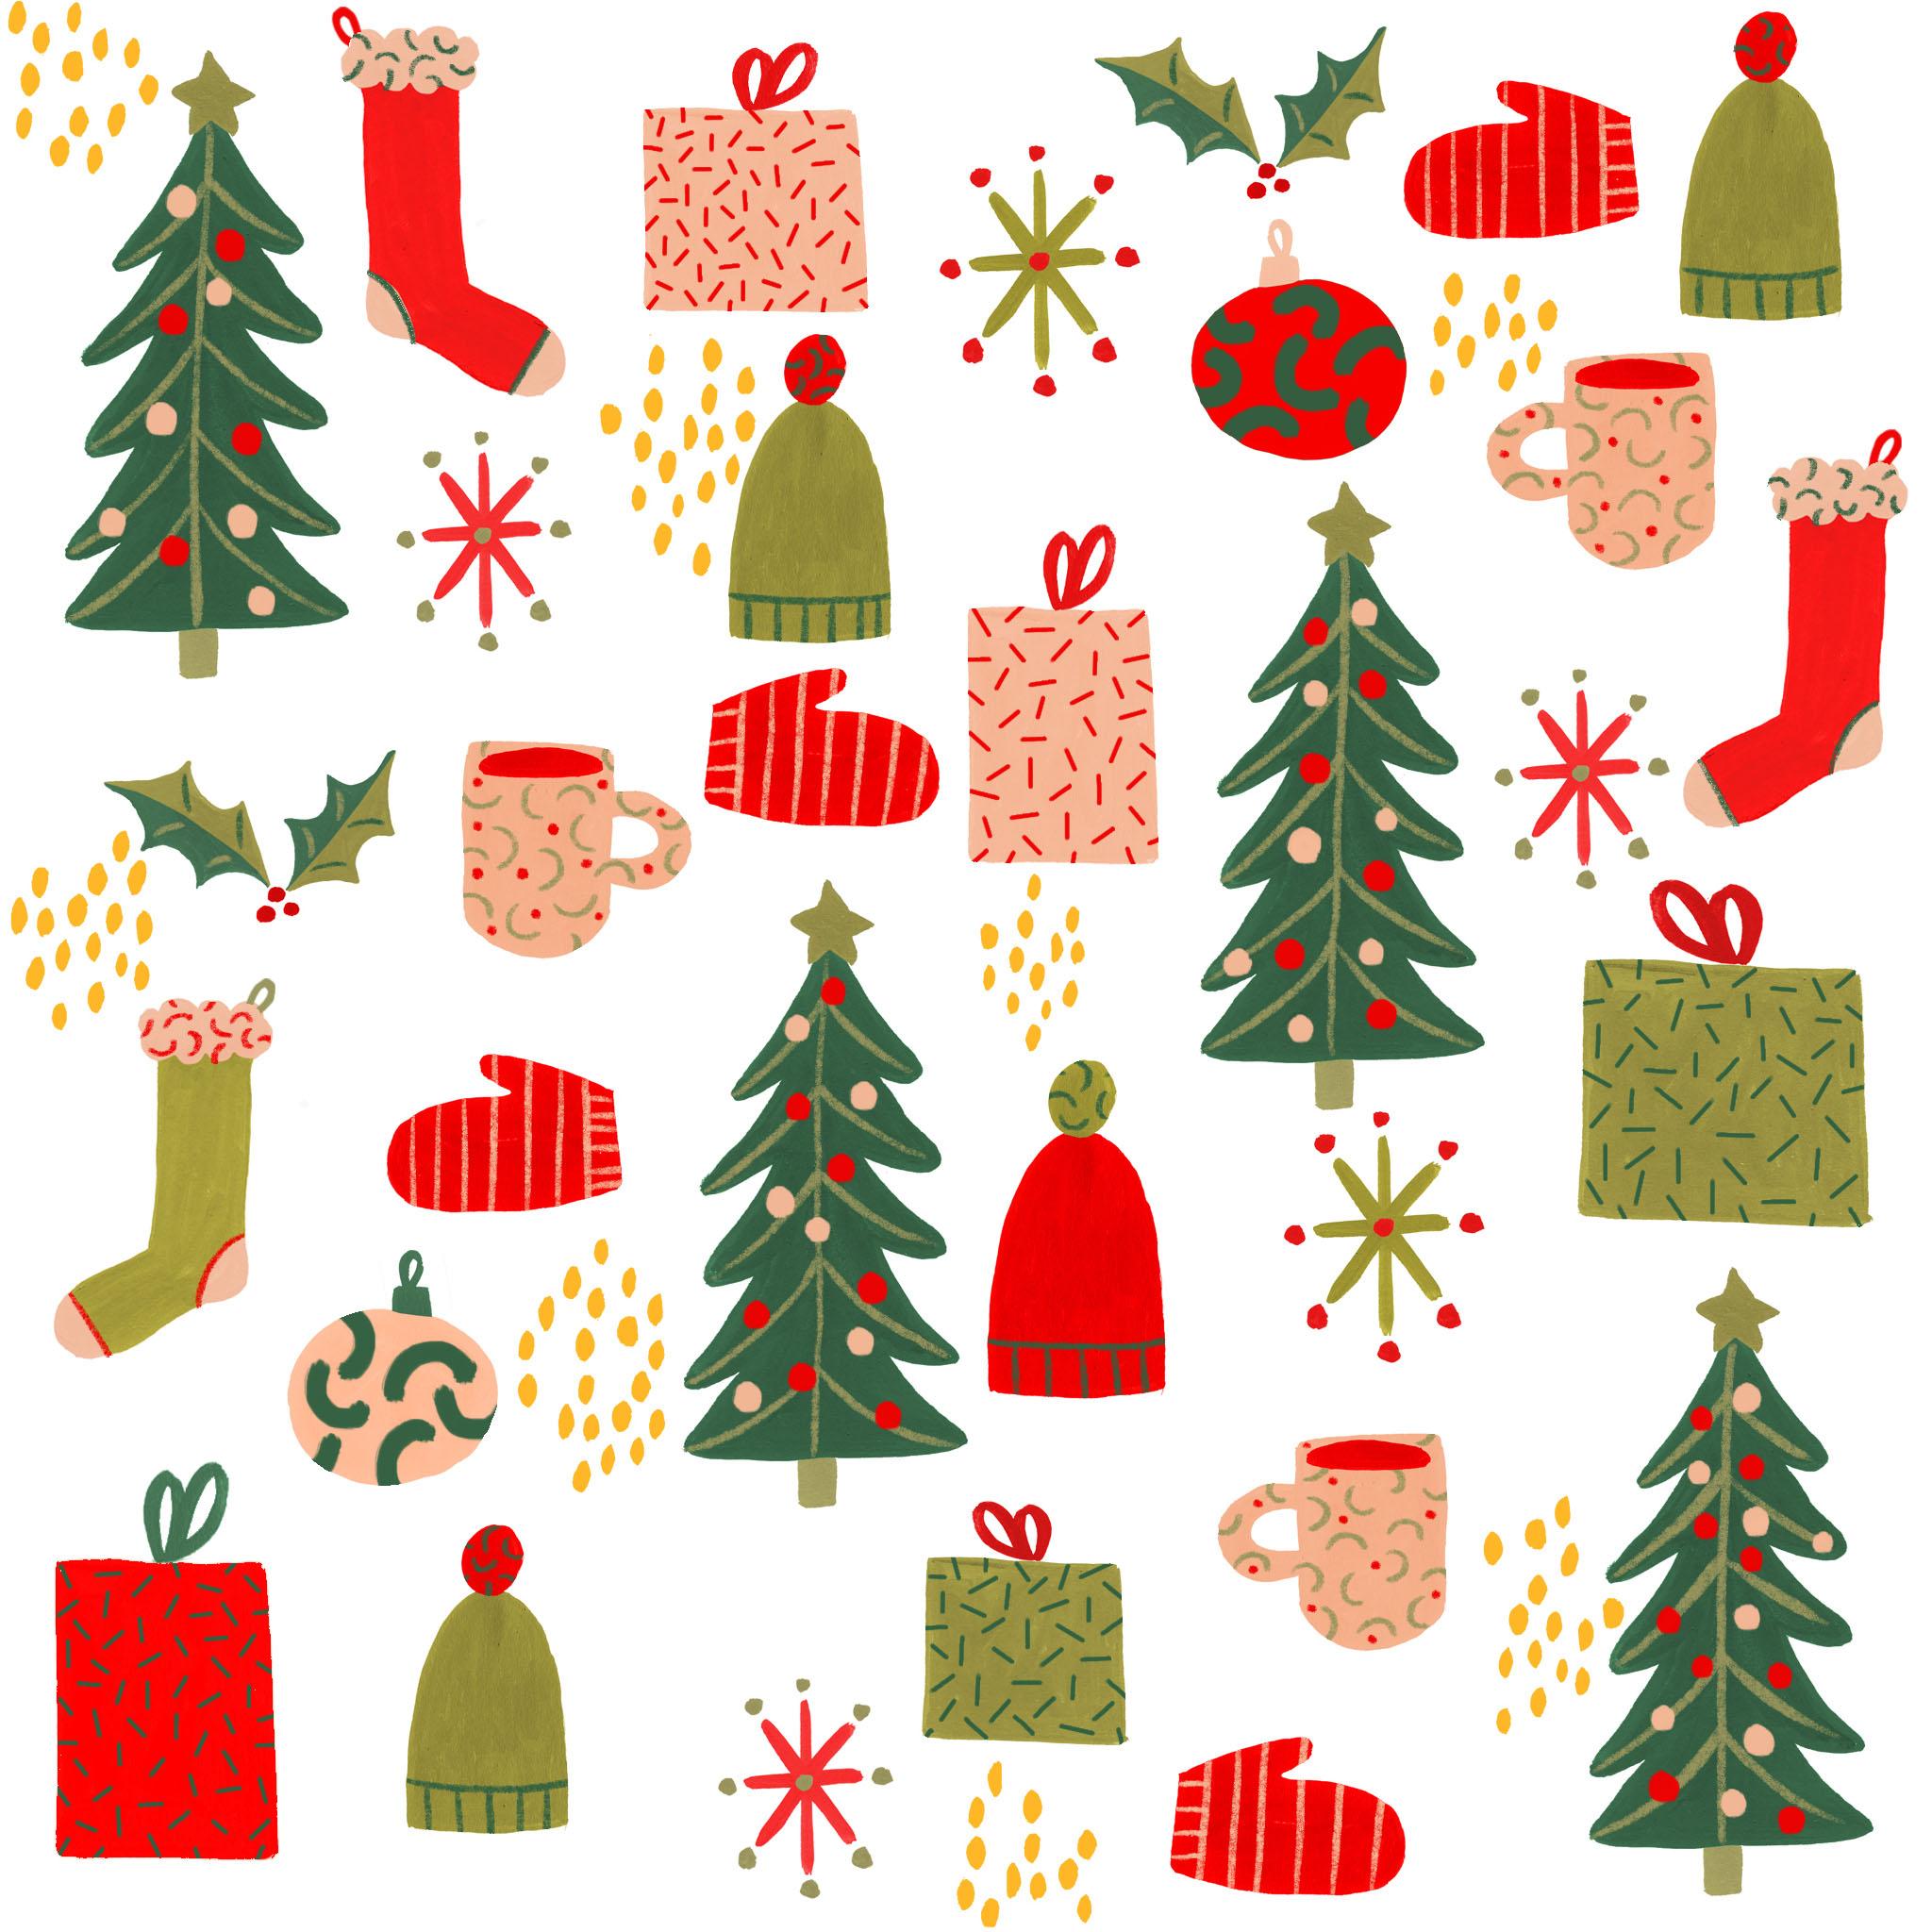 Christmasstuff_Artwork copy.jpg